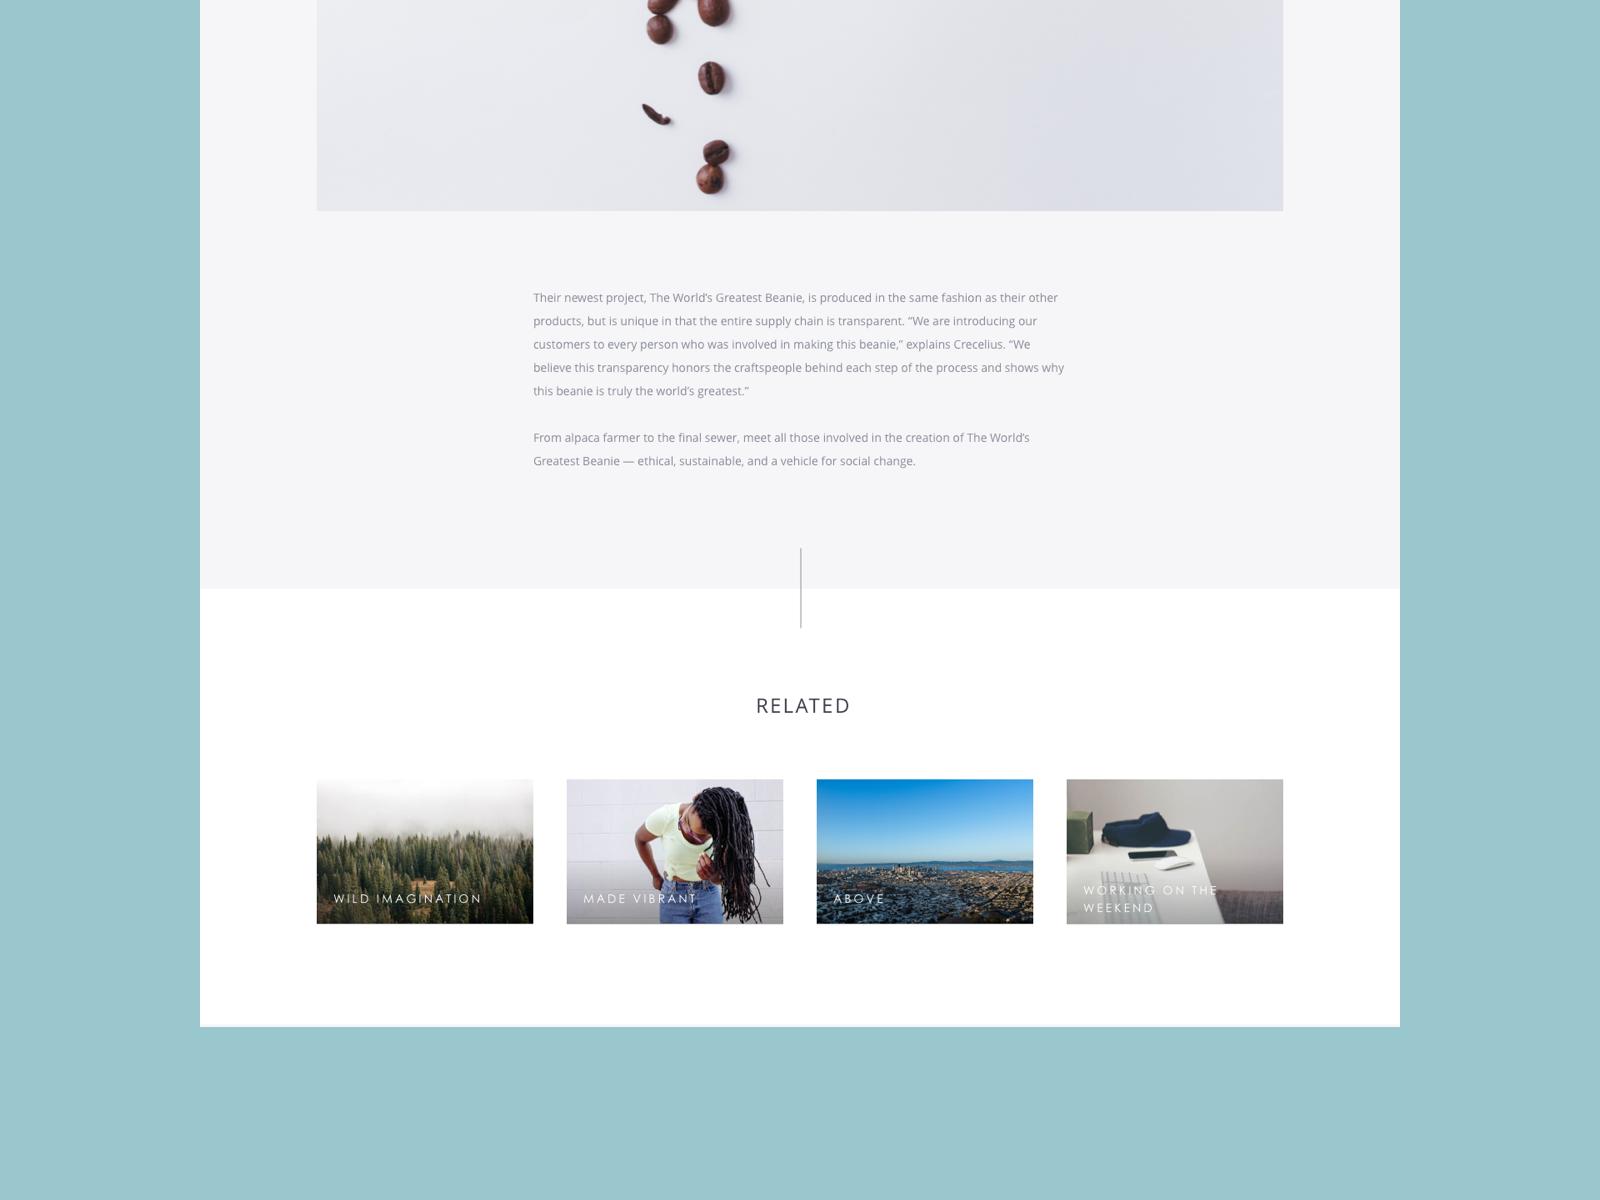 Haiyuan Jiang Freelance Designer For Hire Toptal User Experience Design Experience Design Interface Design